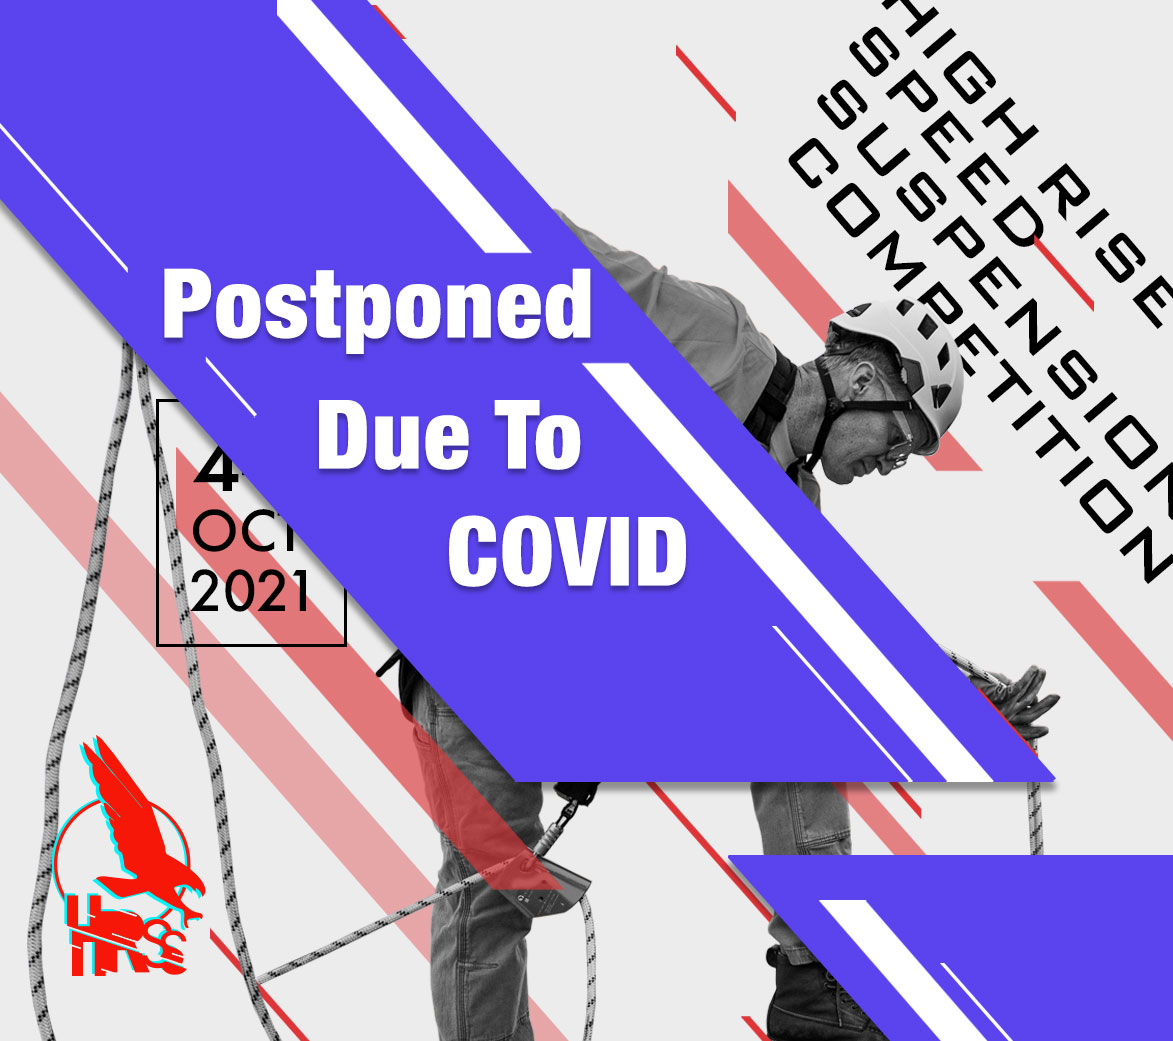 main-hrss-hero-image-postponed.jpg